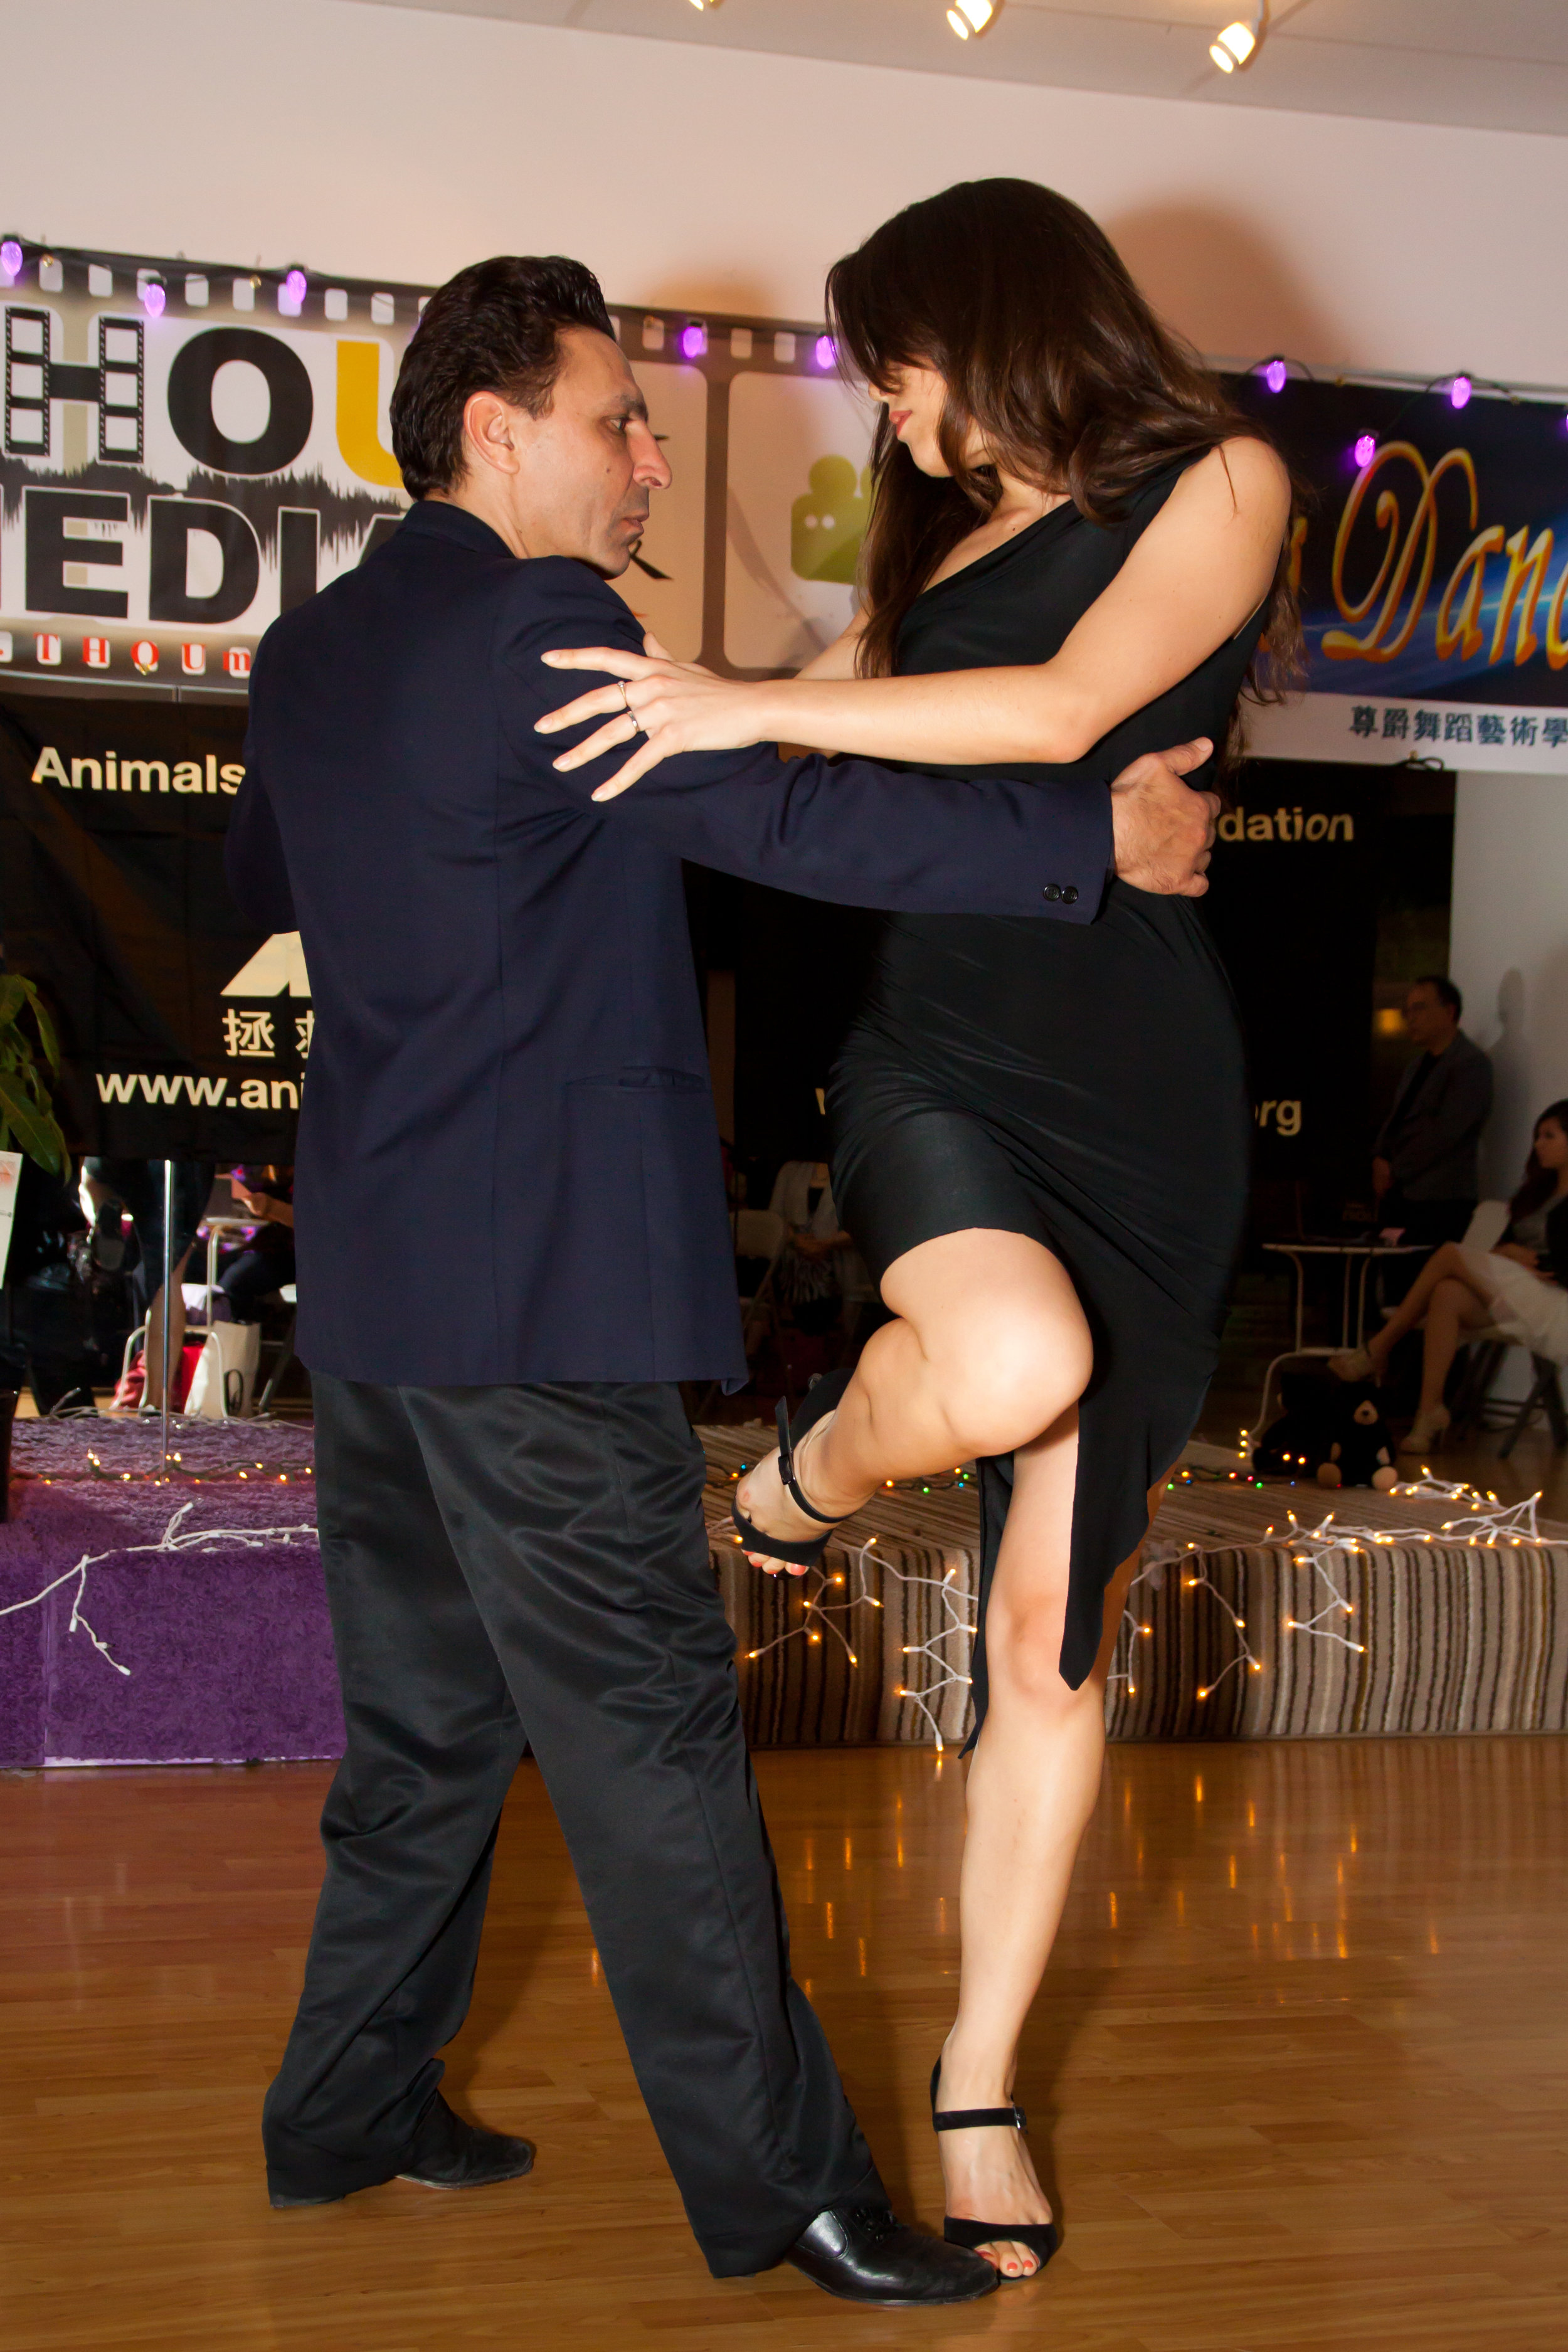 mat mia tango pose 2 .jpg